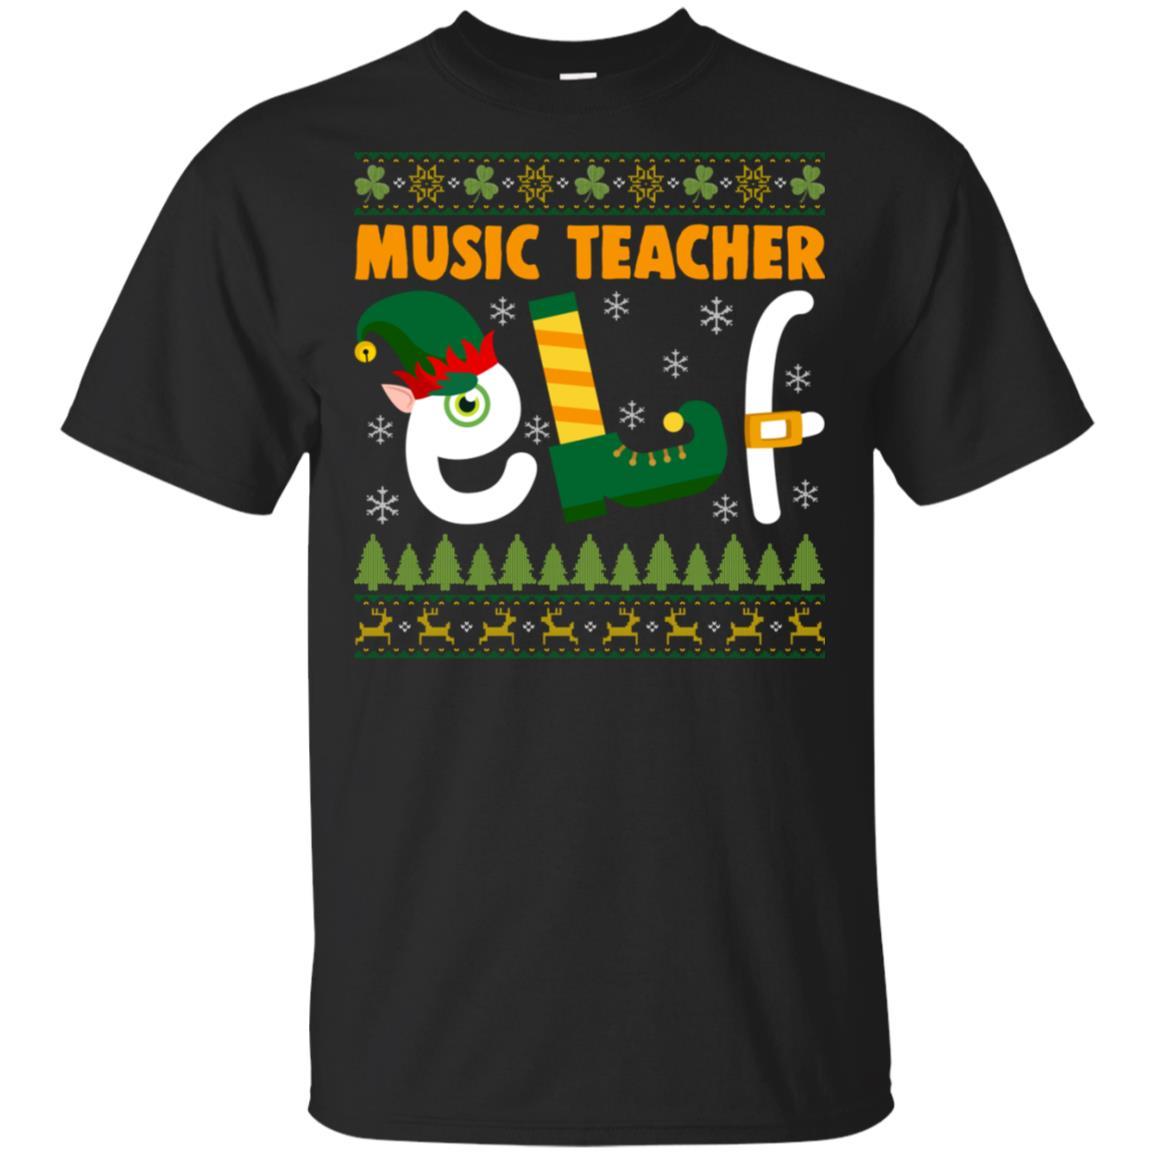 Music Teacher Elf Unisex Short Sleeve